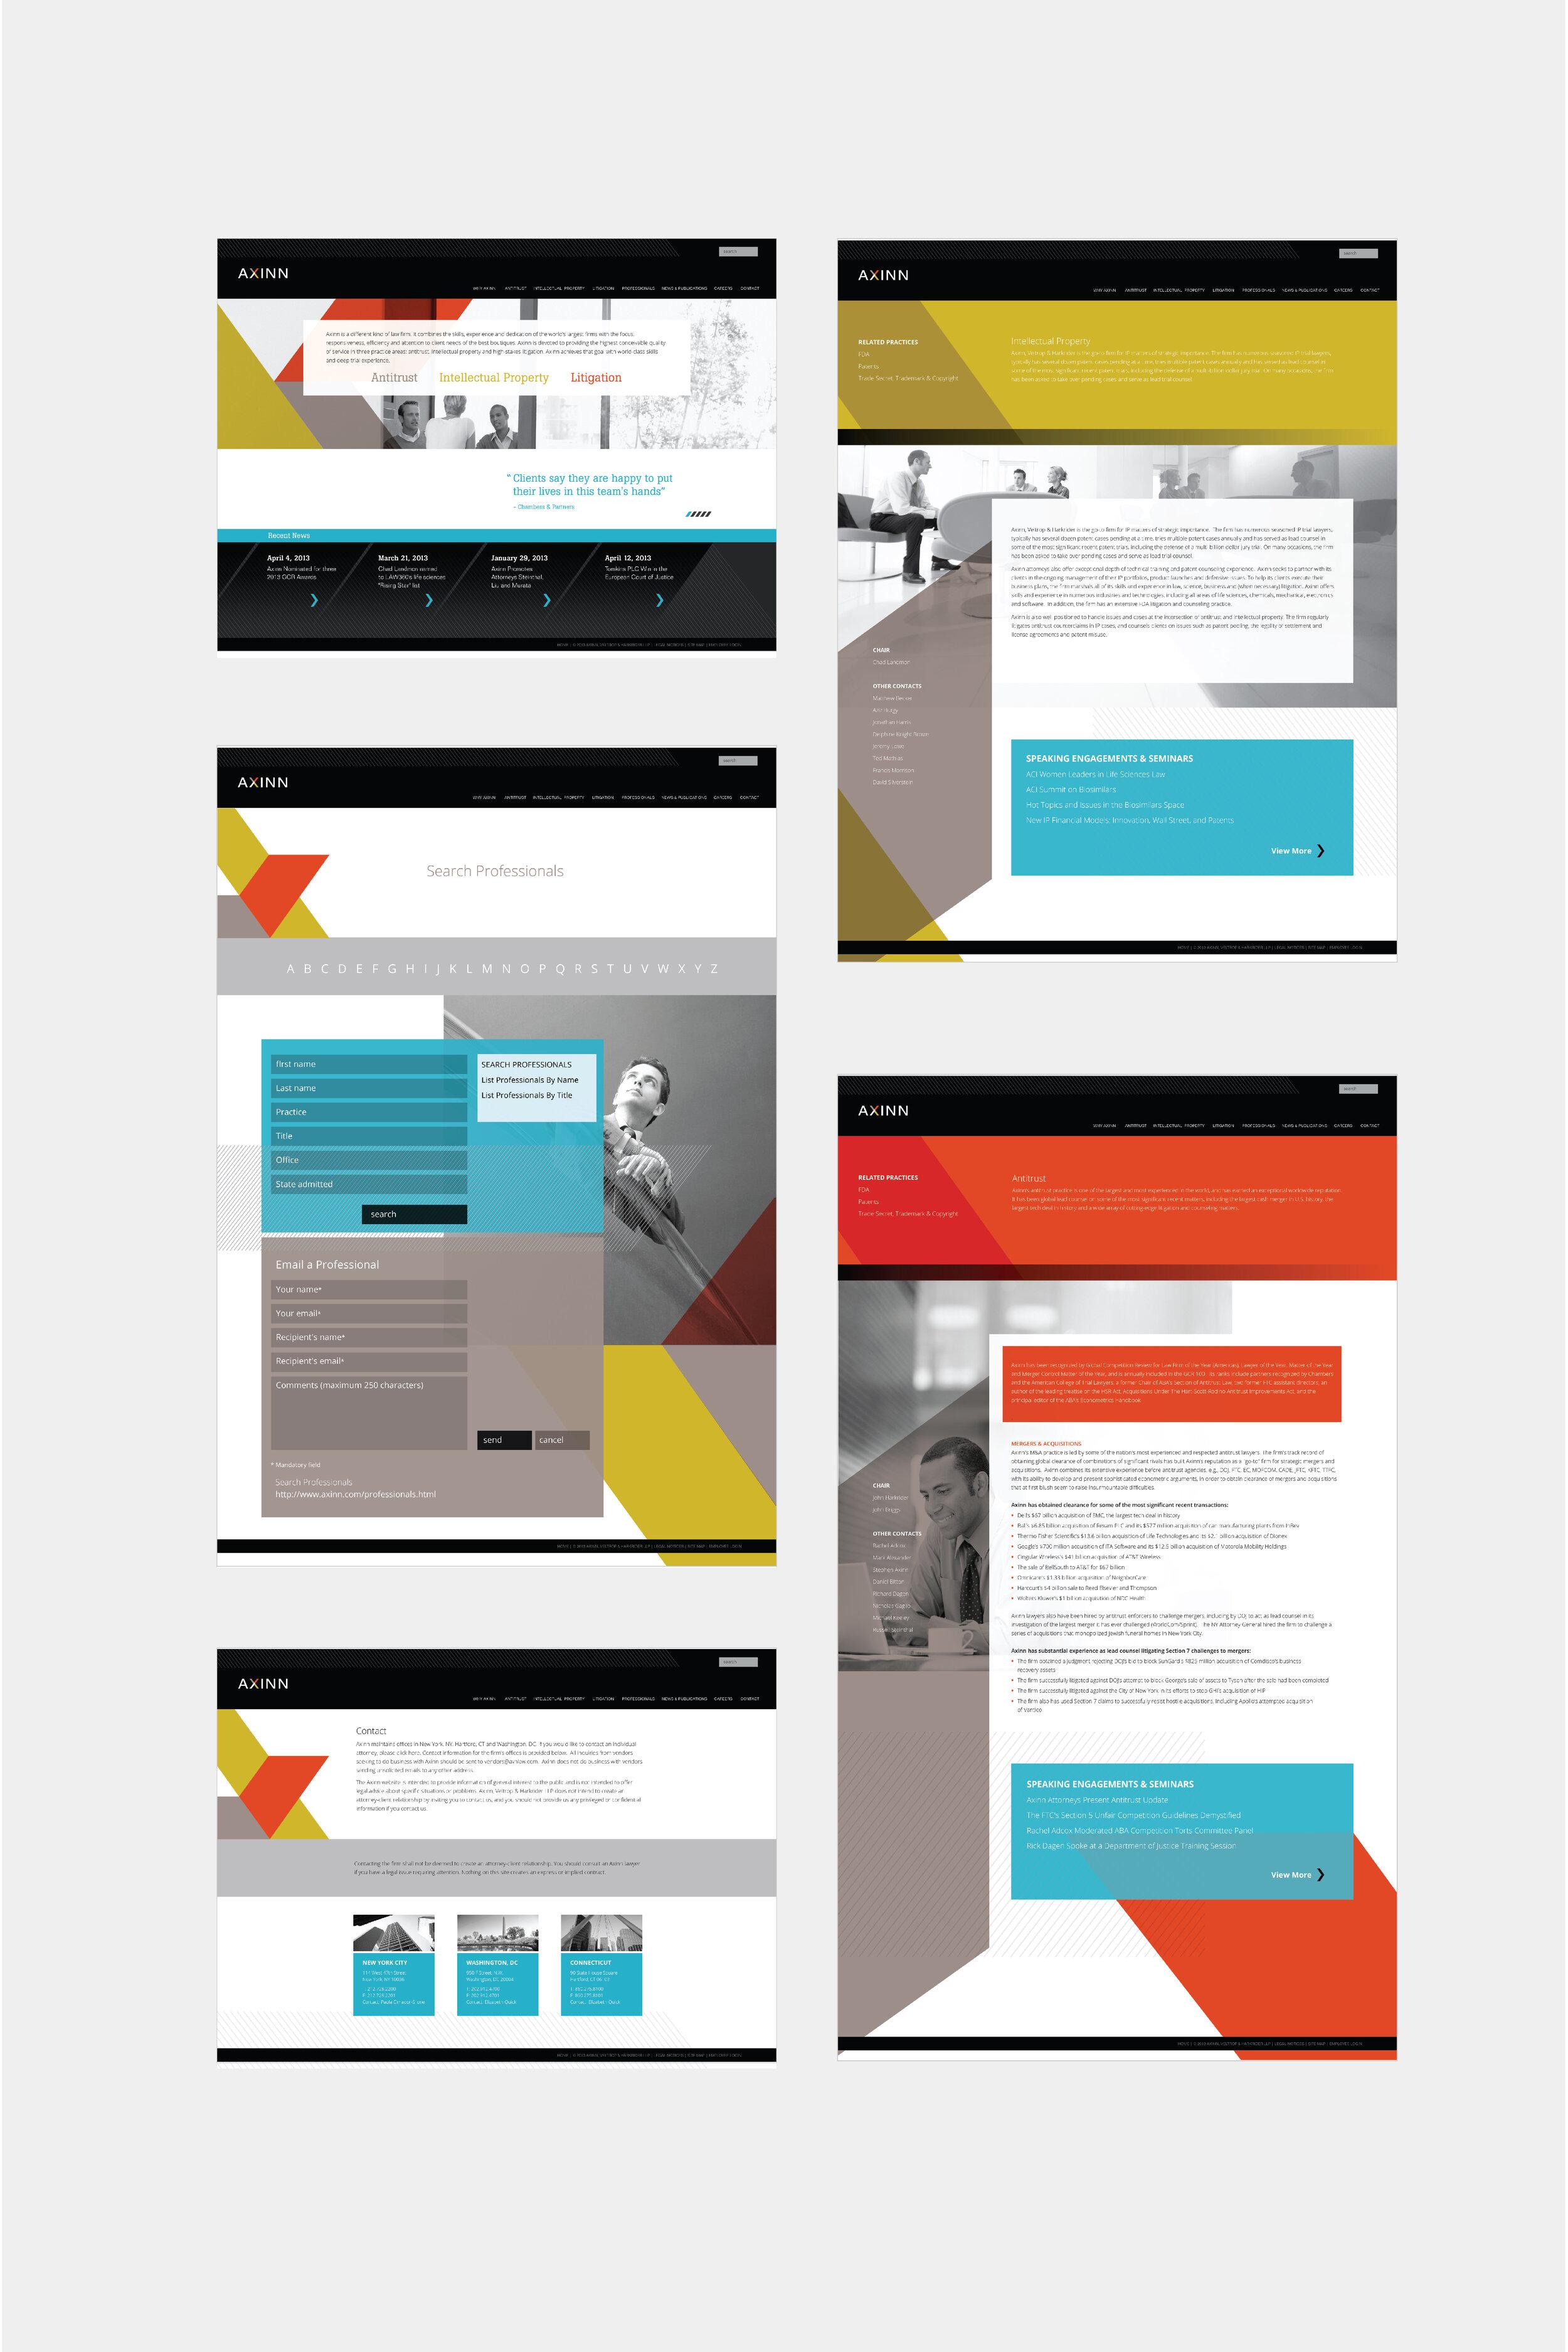 axinn website together-01.jpg